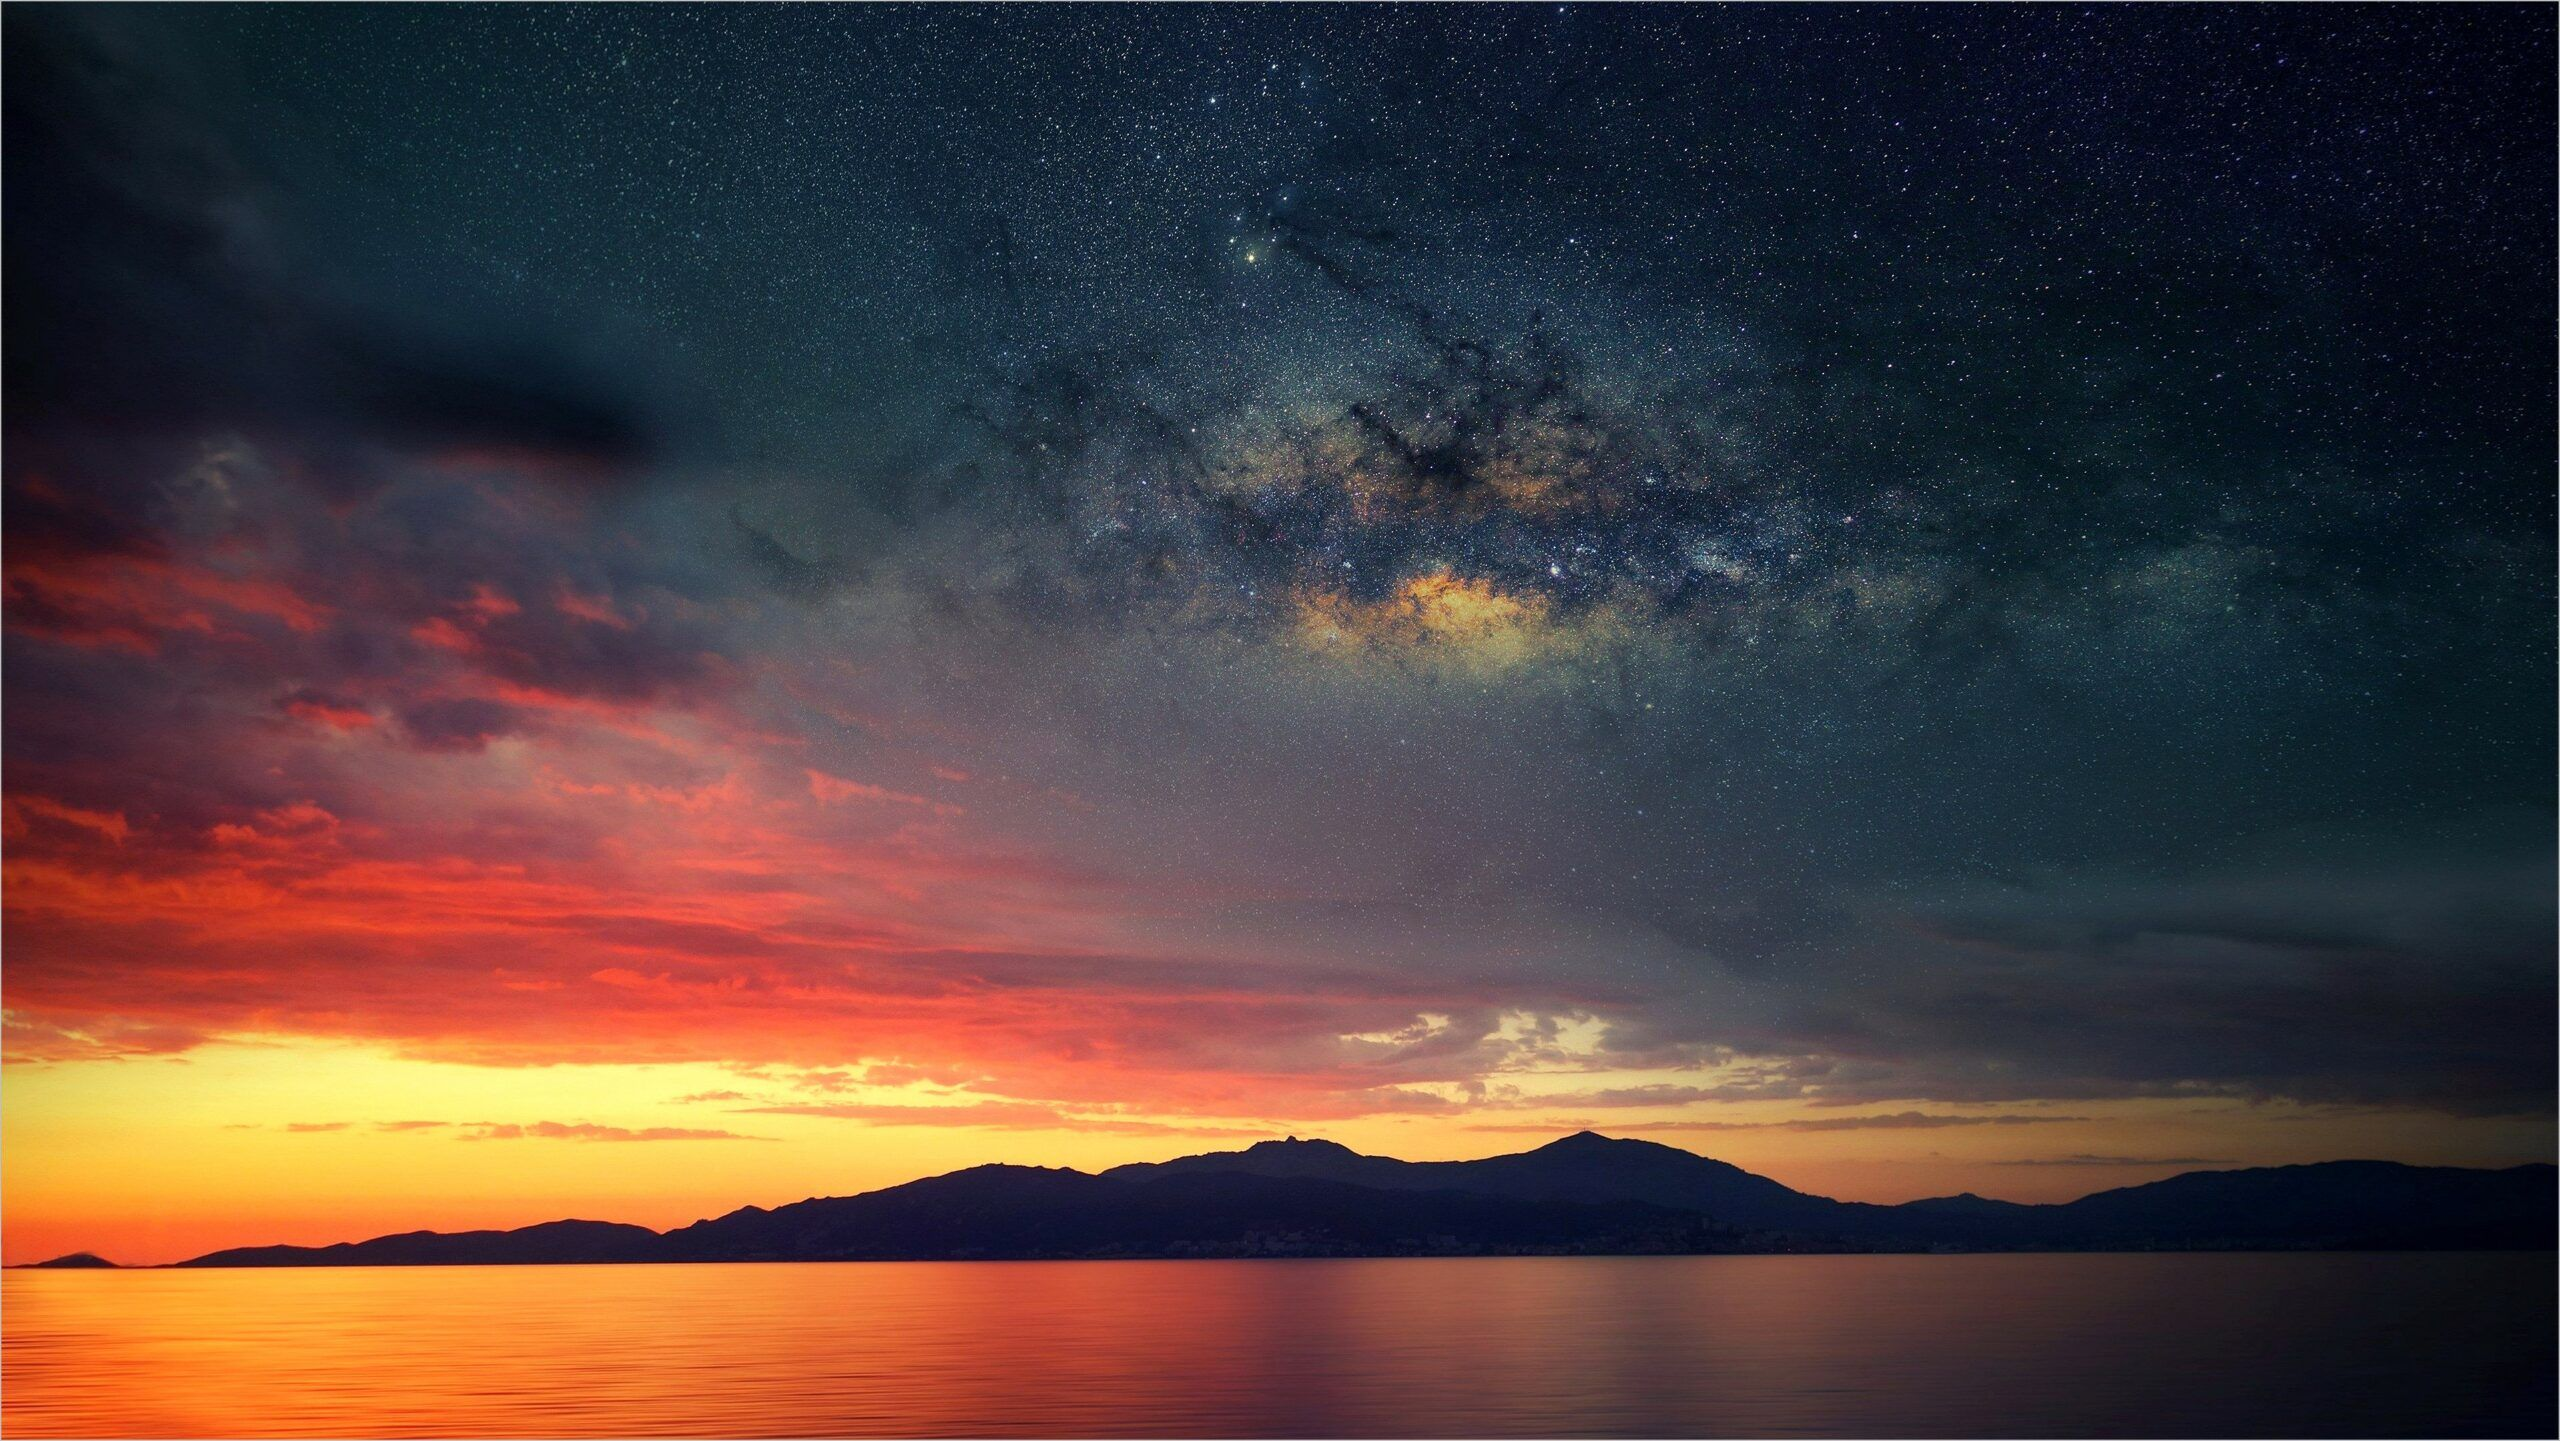 Best Pc 4k Wallpapers Galaxy Wallpaper Ipad Pro Wallpaper Hd Go Wallpaper